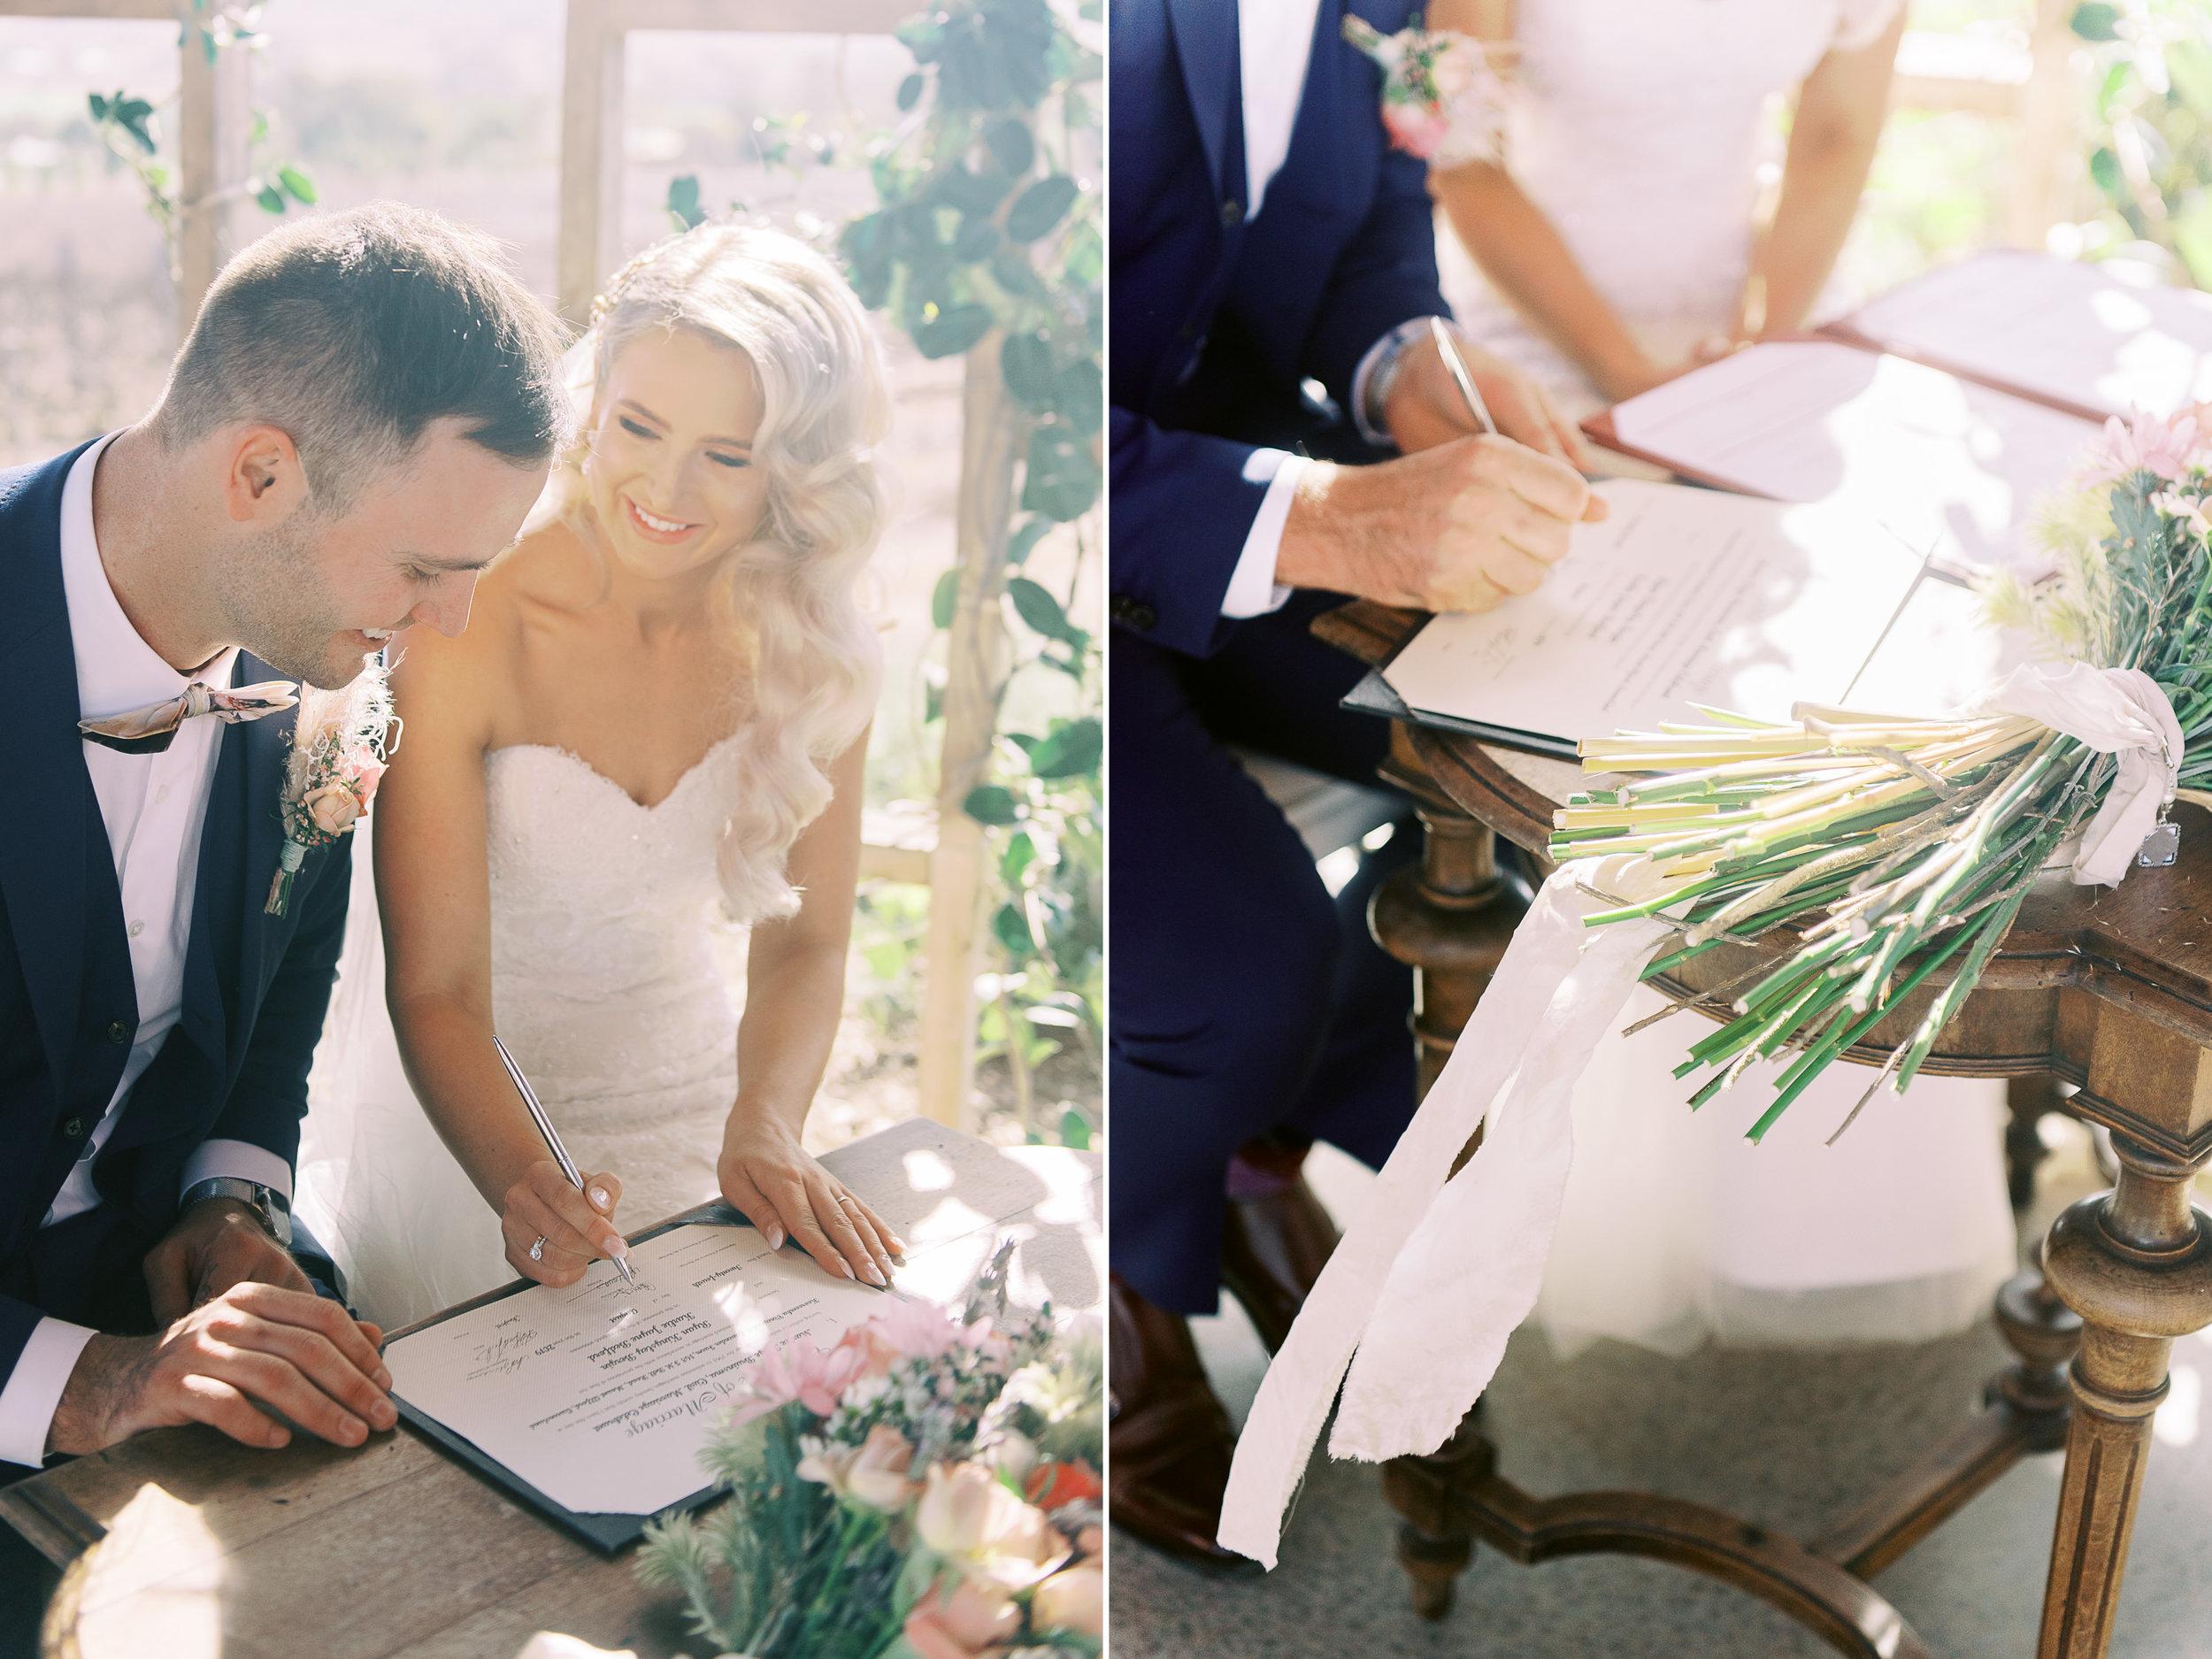 kooroomba-lavendar-farm-film-photography-wedding-photography-romantic-14.jpg